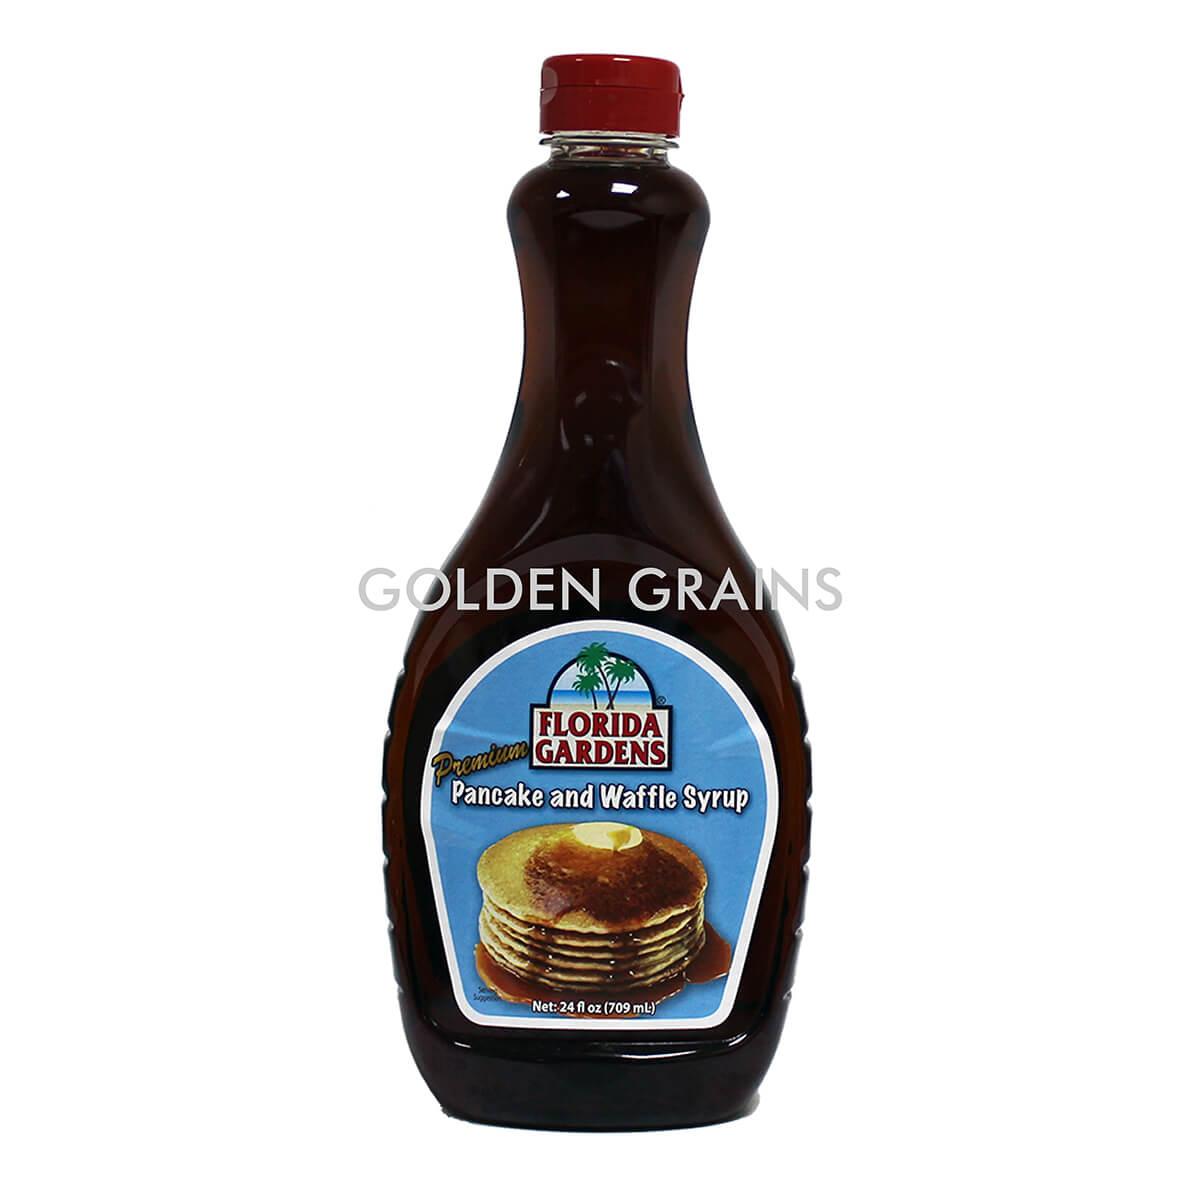 Golden Grains Dubai Export - Florida Garden - Pancake and Waffle Syrup - Front.jpg